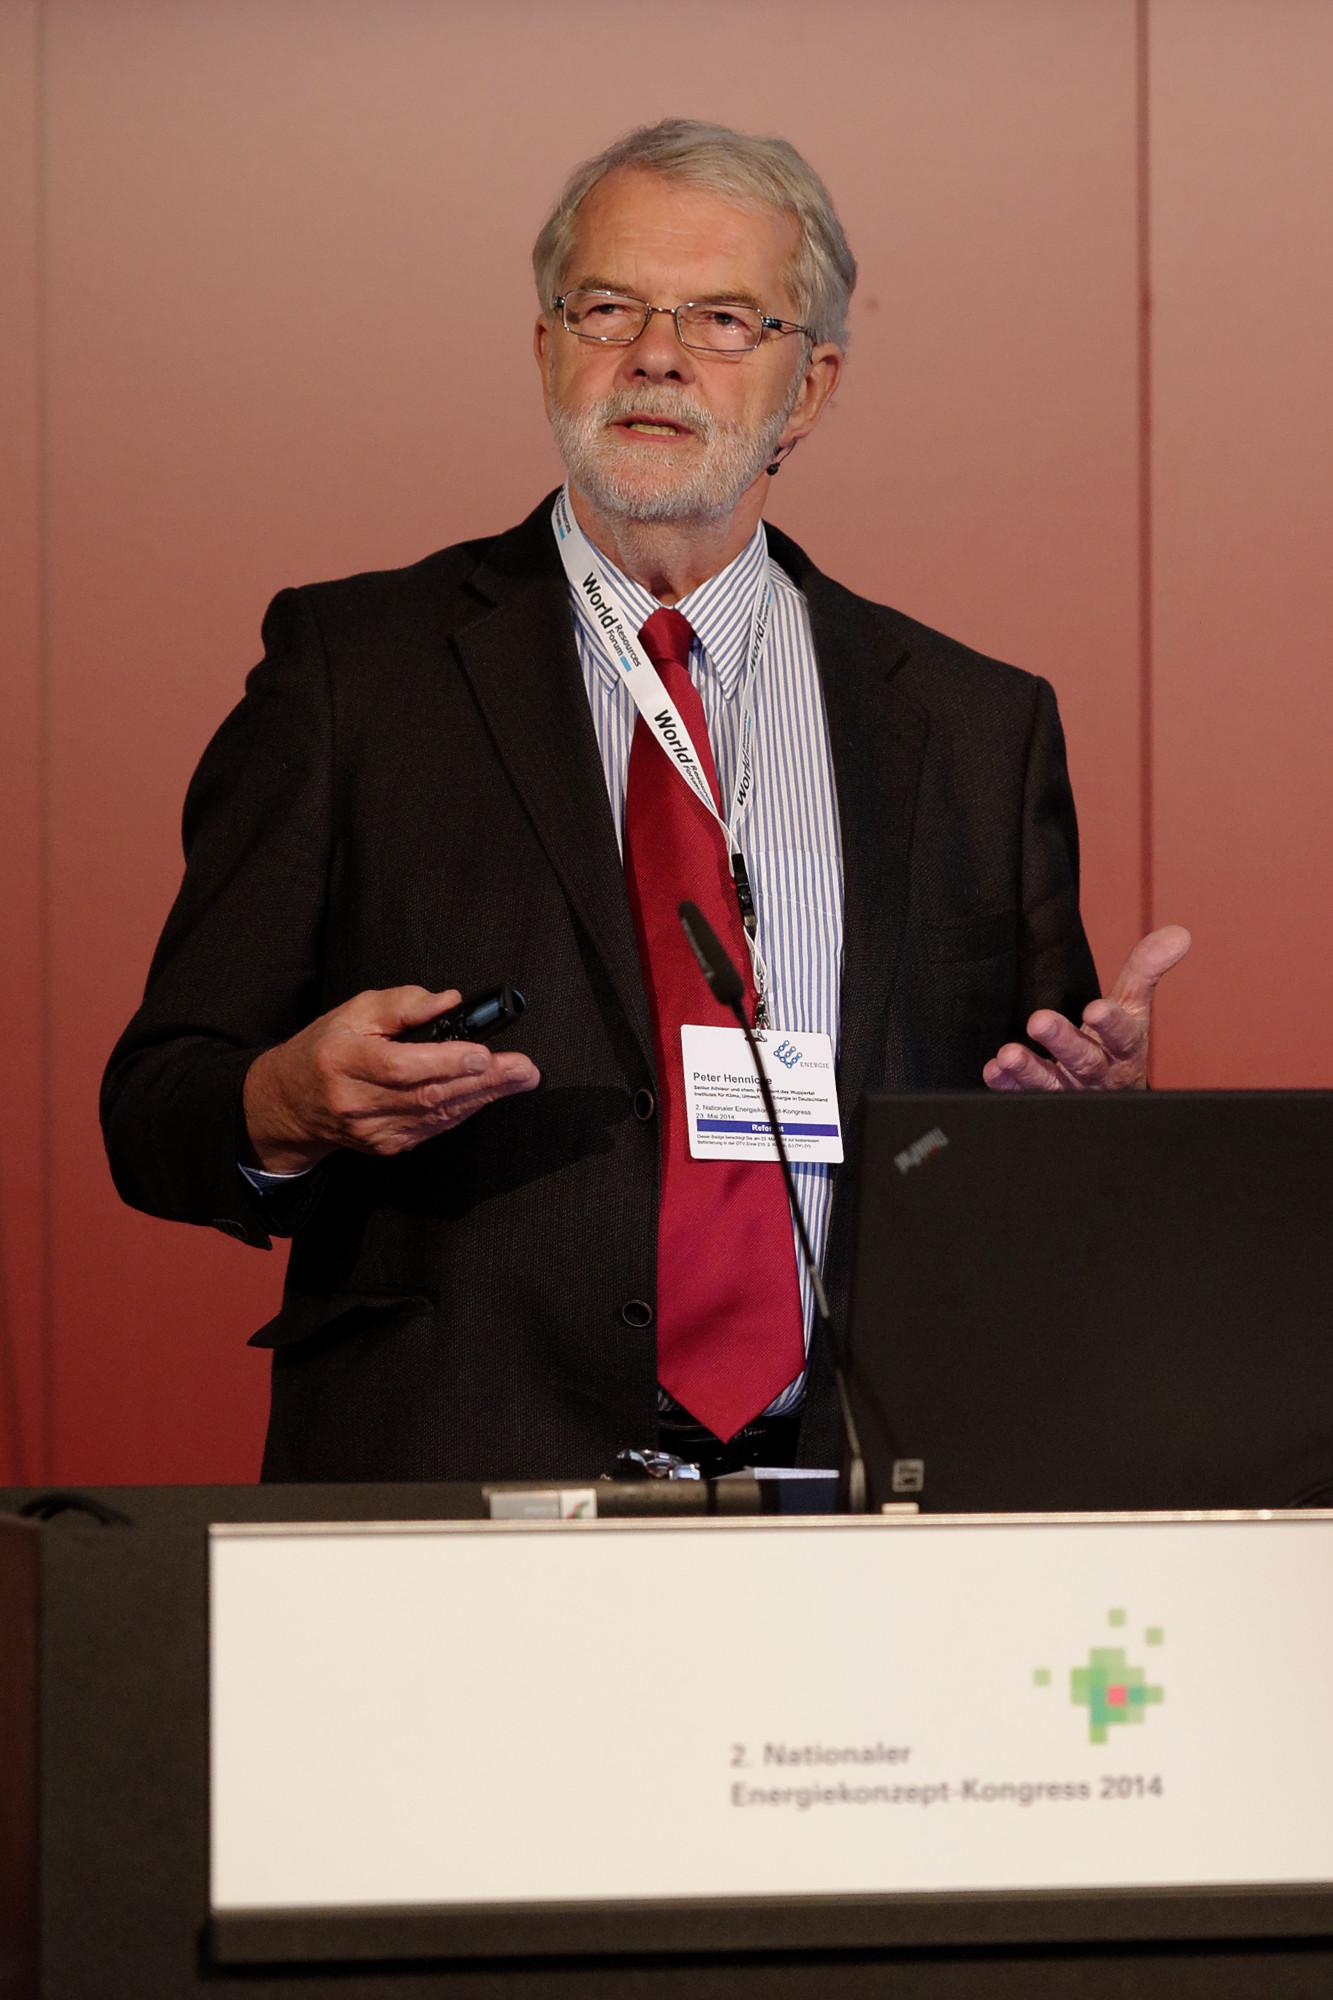 Peter Hennicke